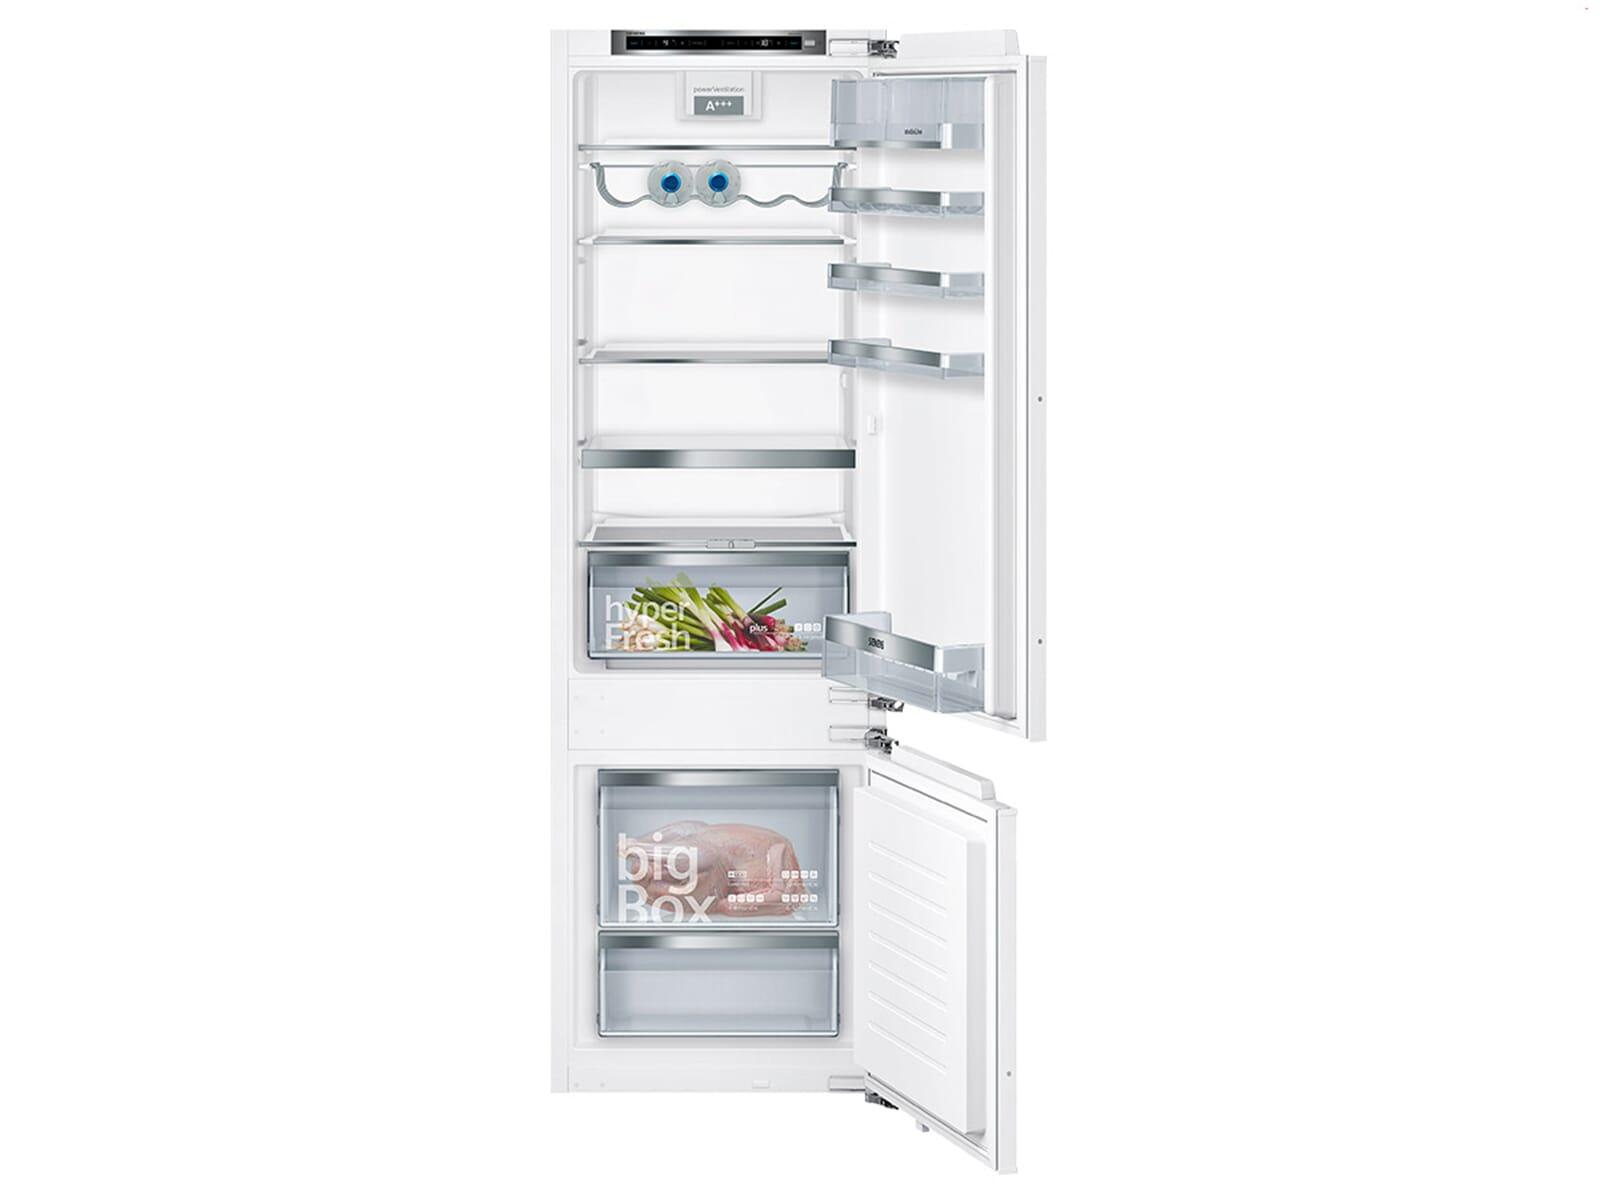 Siemens Studioline Kühlschrank : Siemens studioline ki ssd einbau kühl gefrierkombination